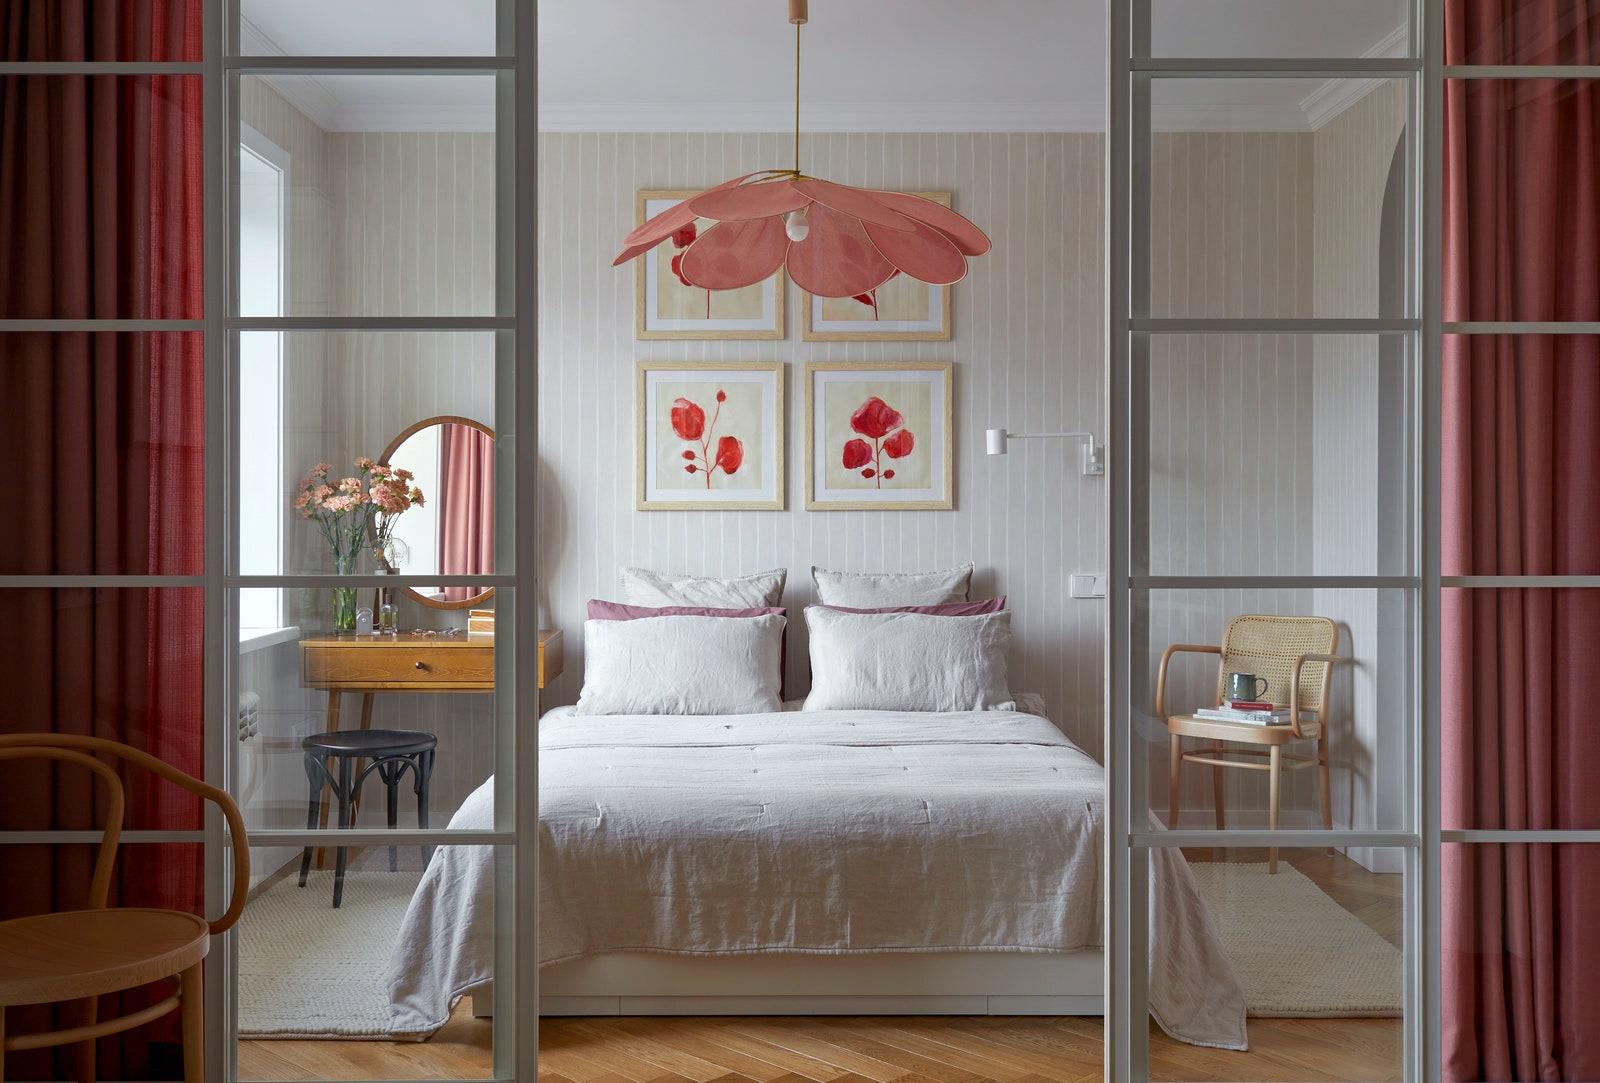 .   HelgBergStudio    IKEA          Zara Home    Ton   Georges  ColeampSon  Tantum Quercus  Tikkurila.